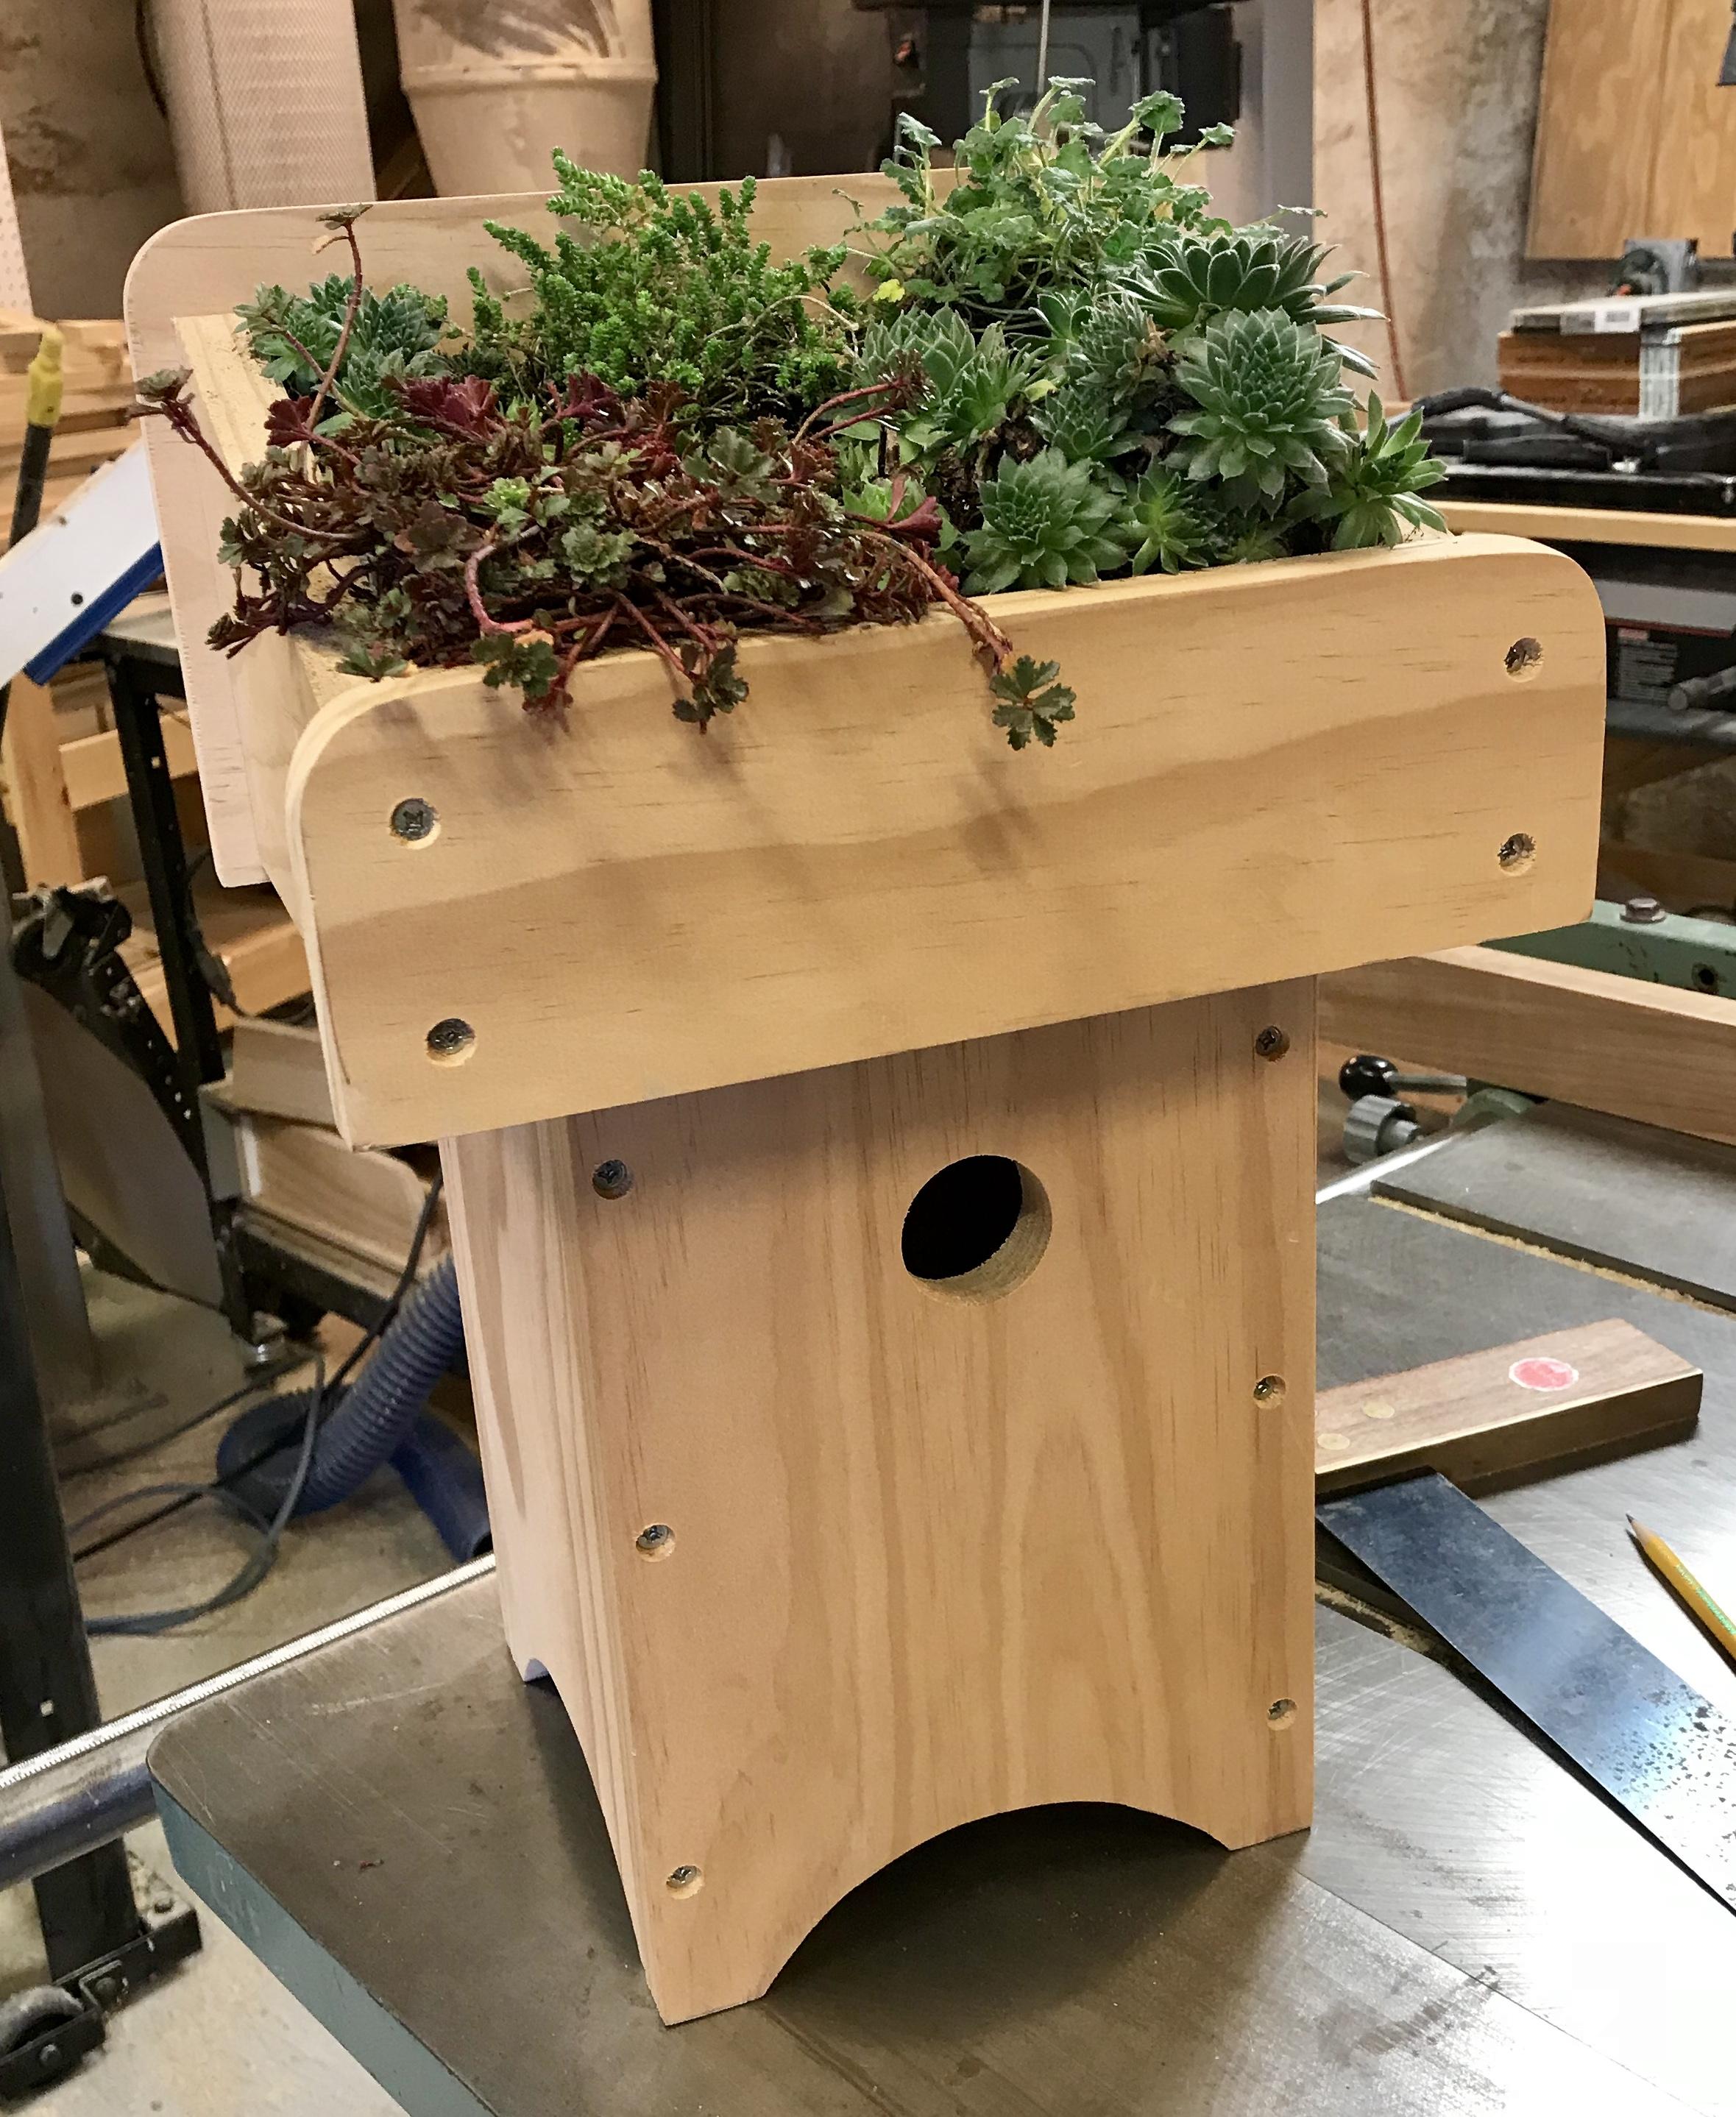 Frank Perrone Design Green Roof Birdhouse